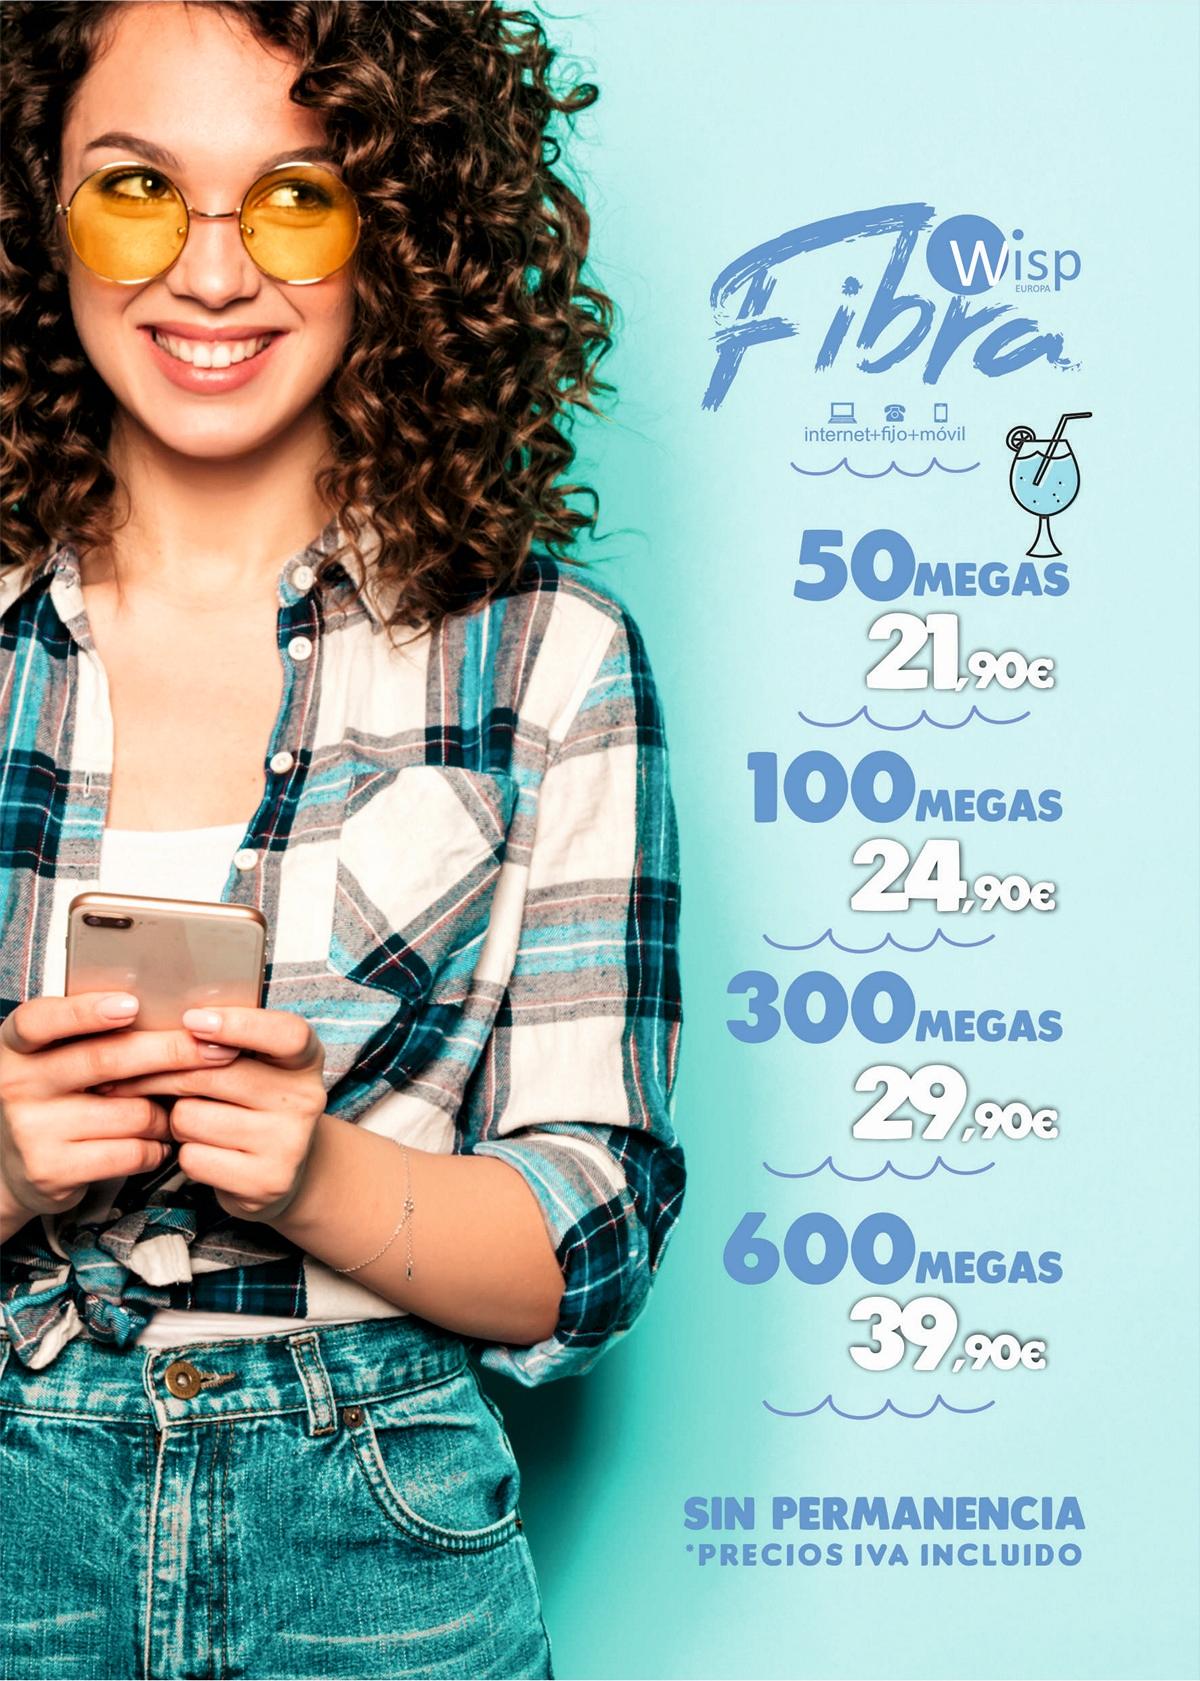 WISP Europa - Tarifas Internet FIBRA 2020